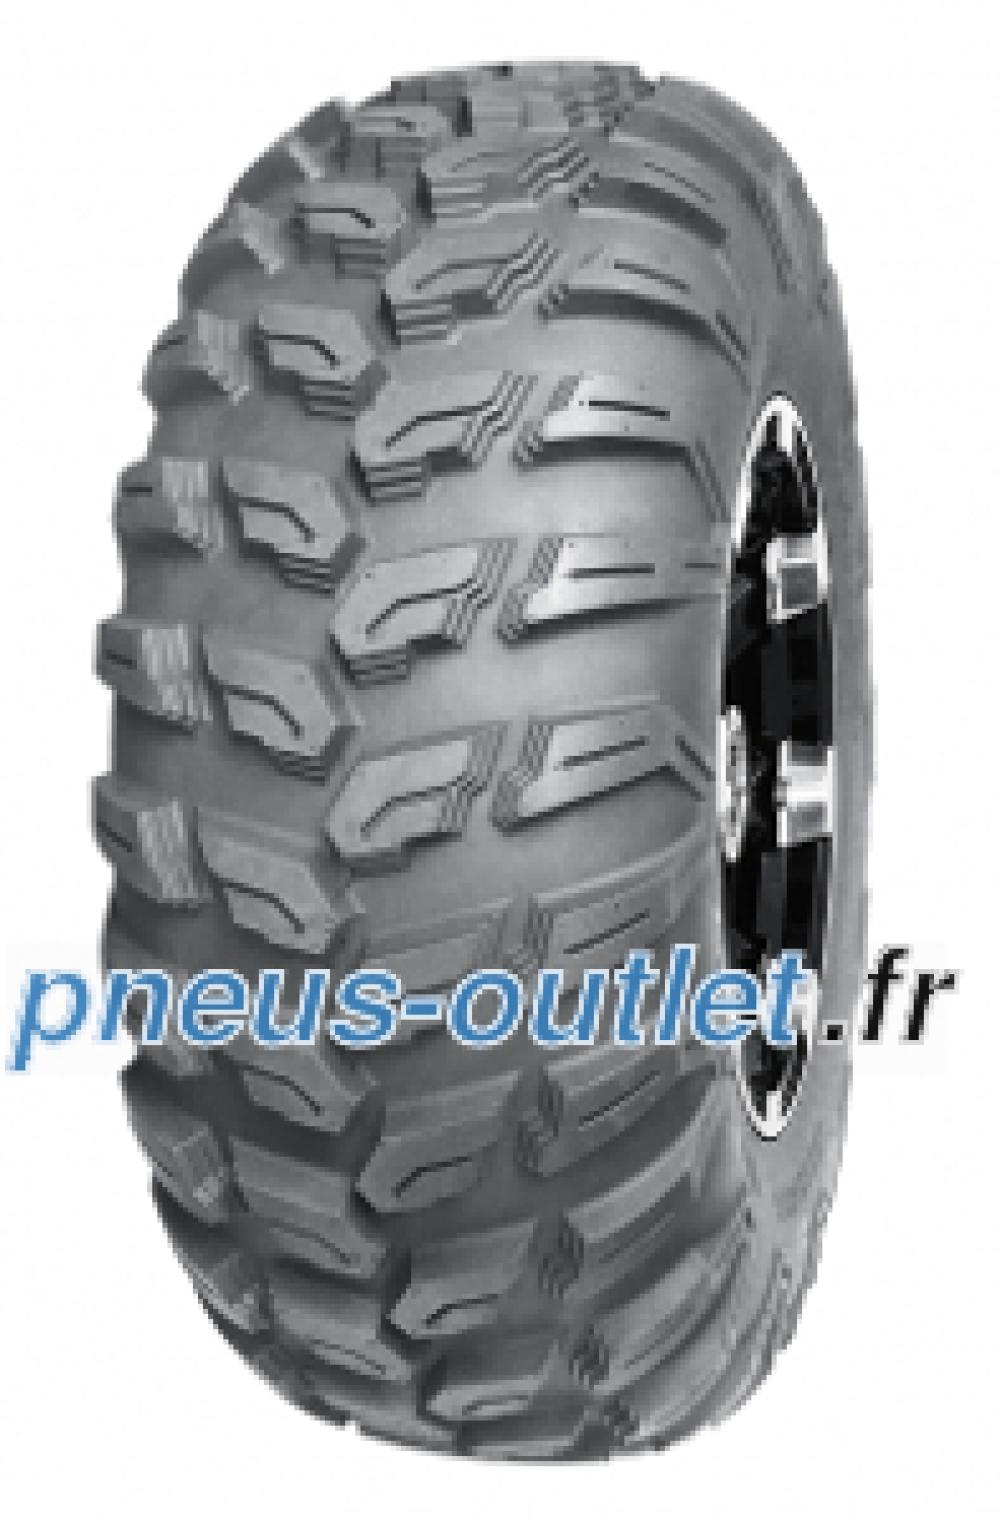 Journey P3035 ( 25x8.00 R12 6PR TL )